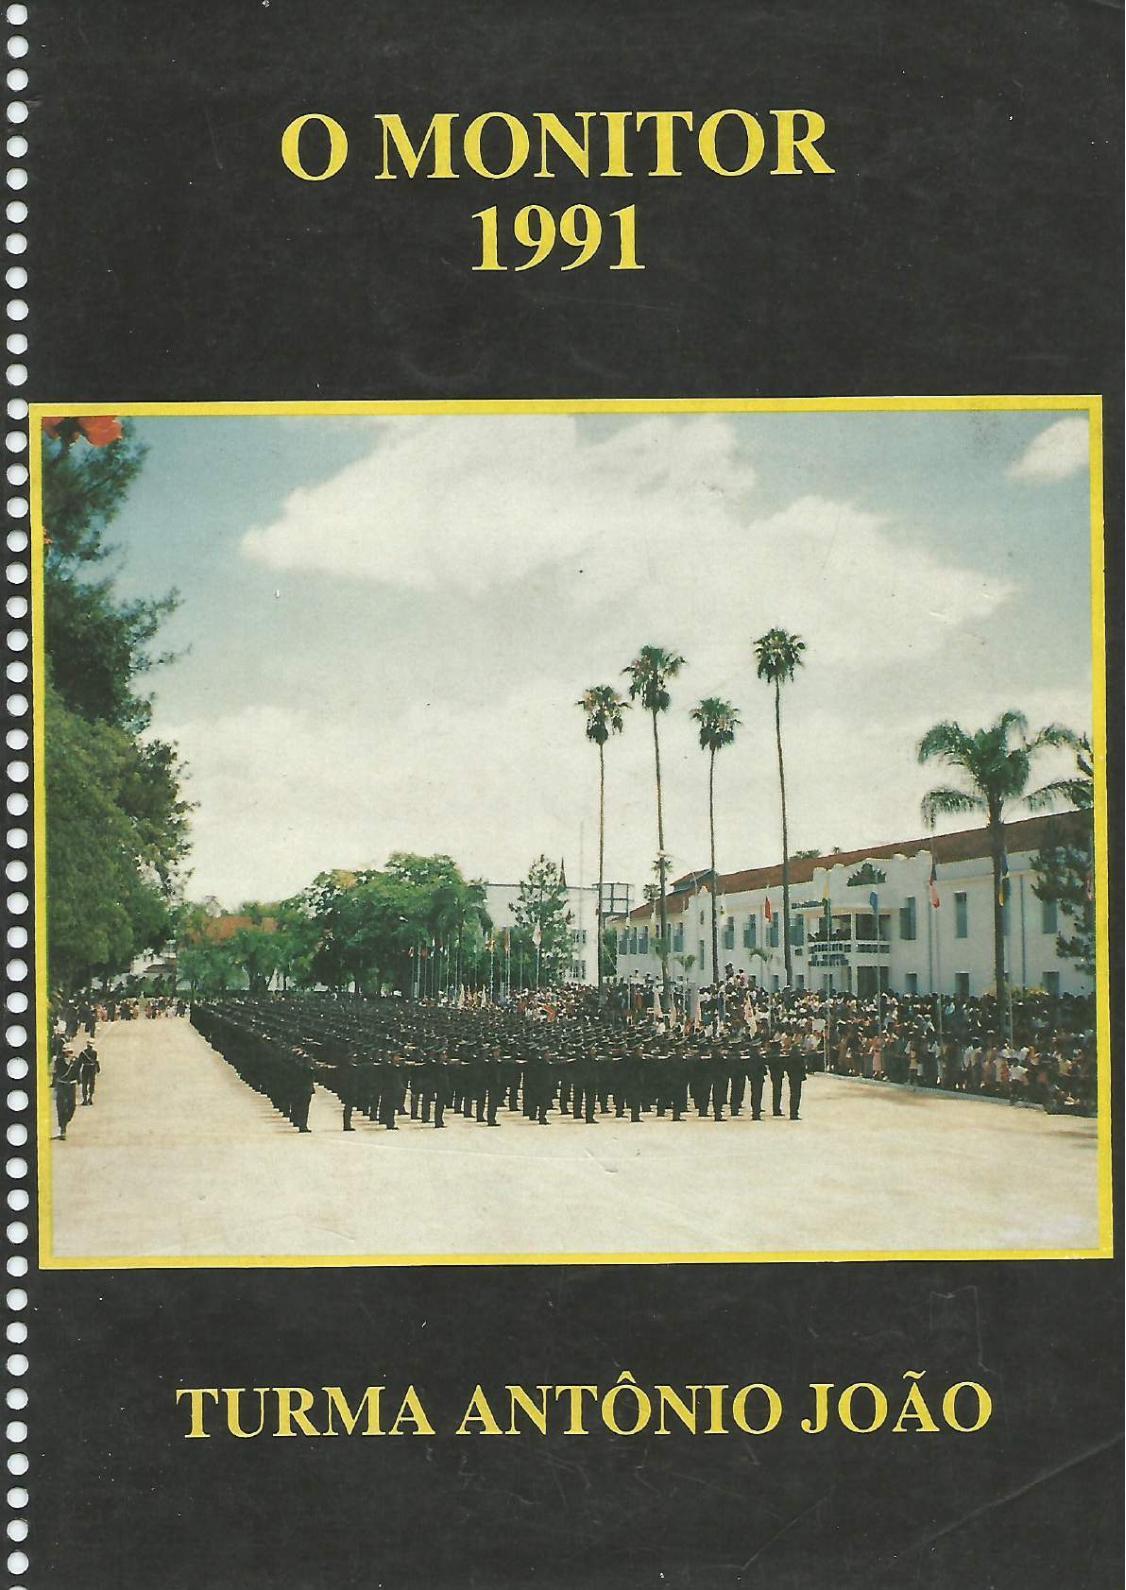 O Monitor 1991